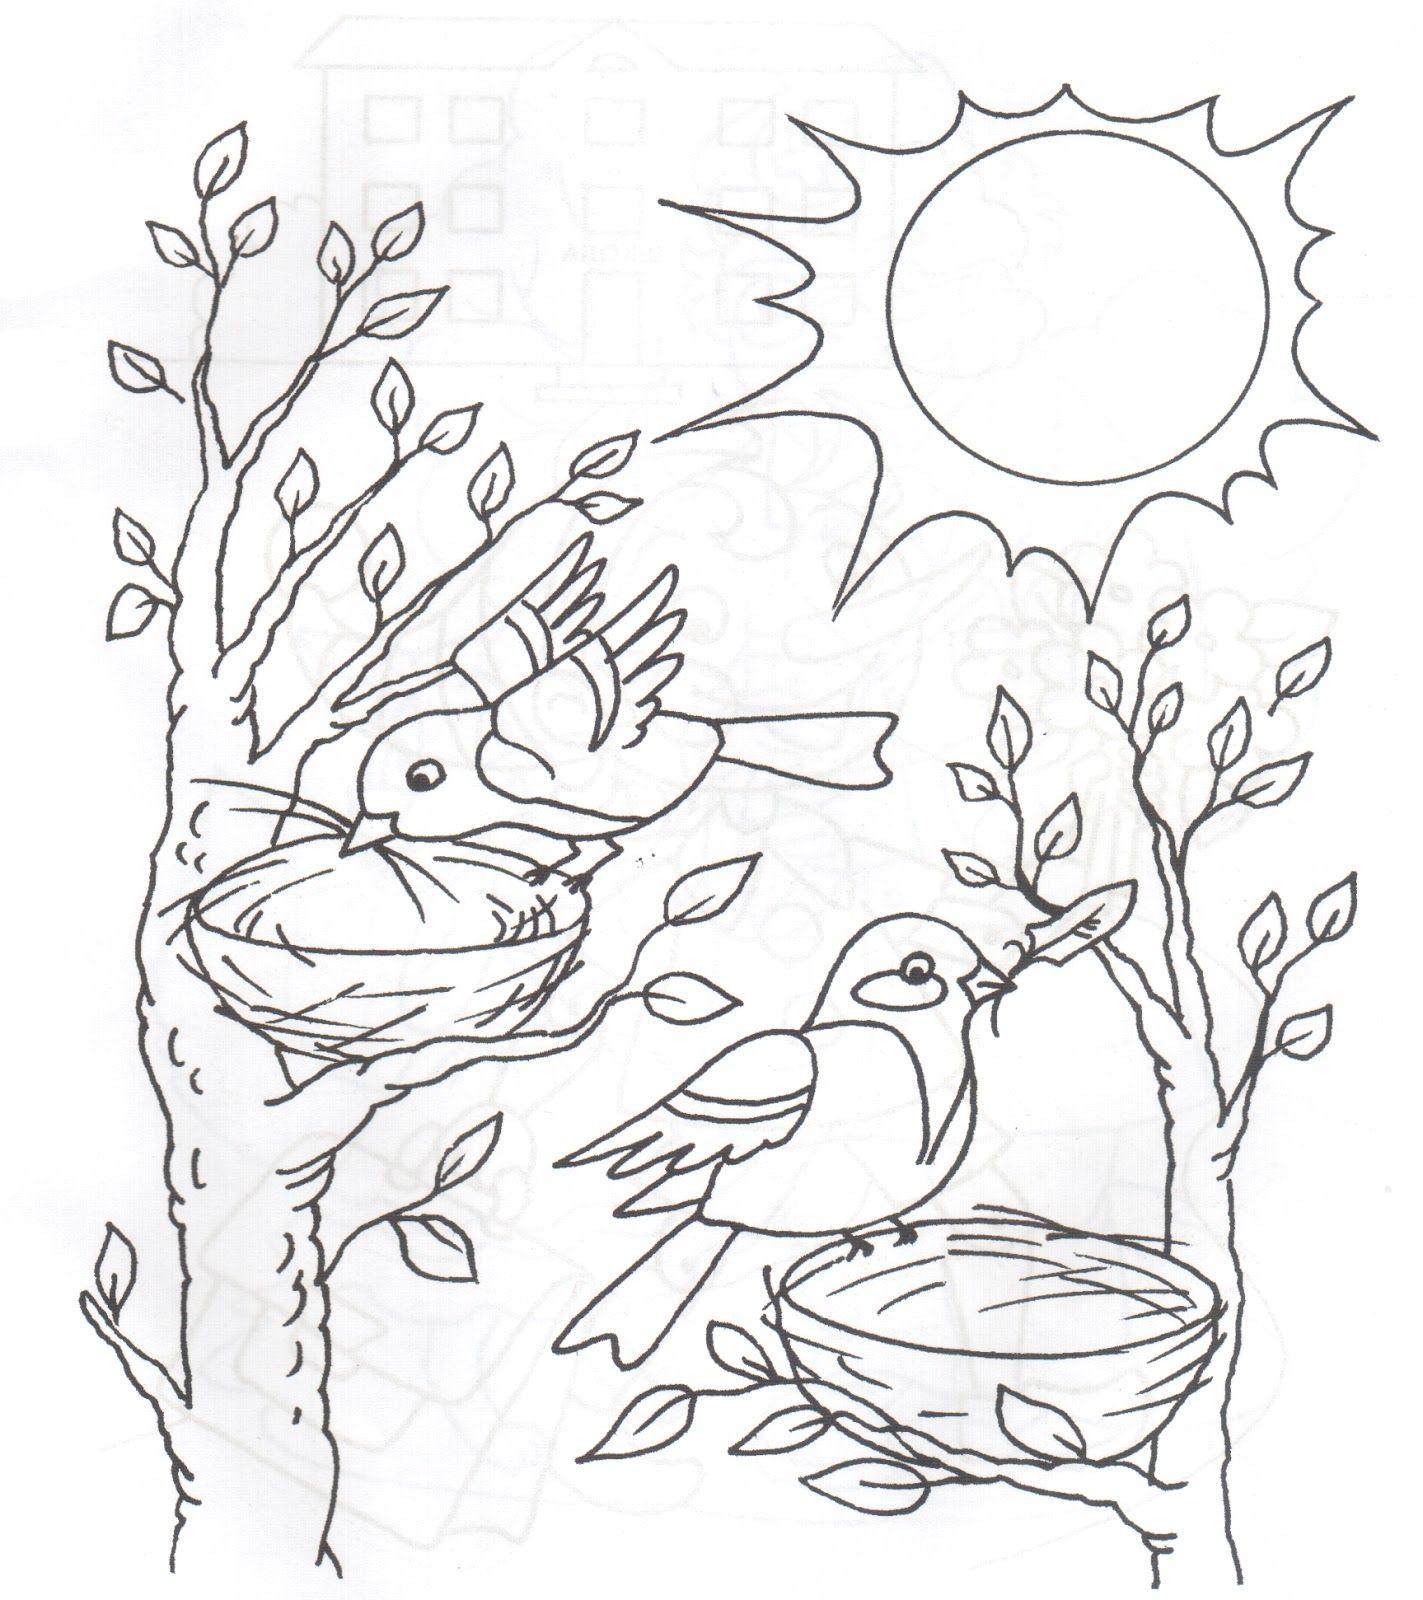 зверьки апрель рисунки карандашом могли ходить